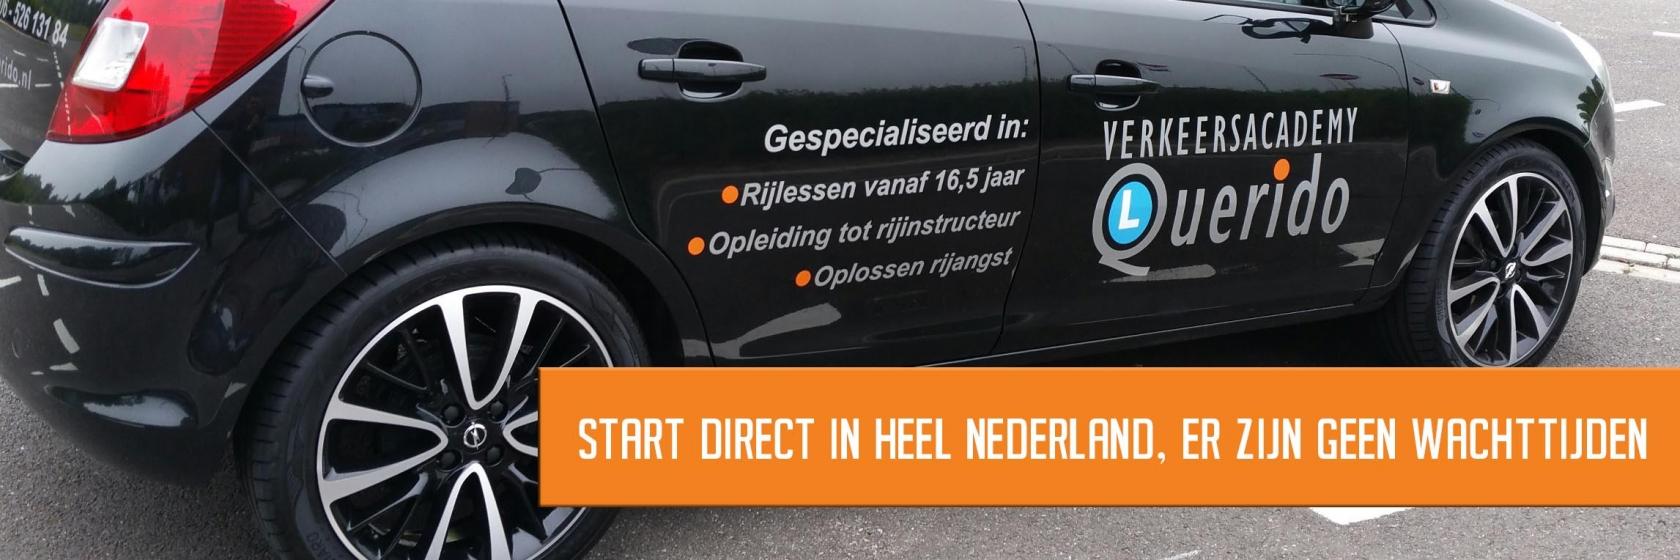 Lessen in heel nederland